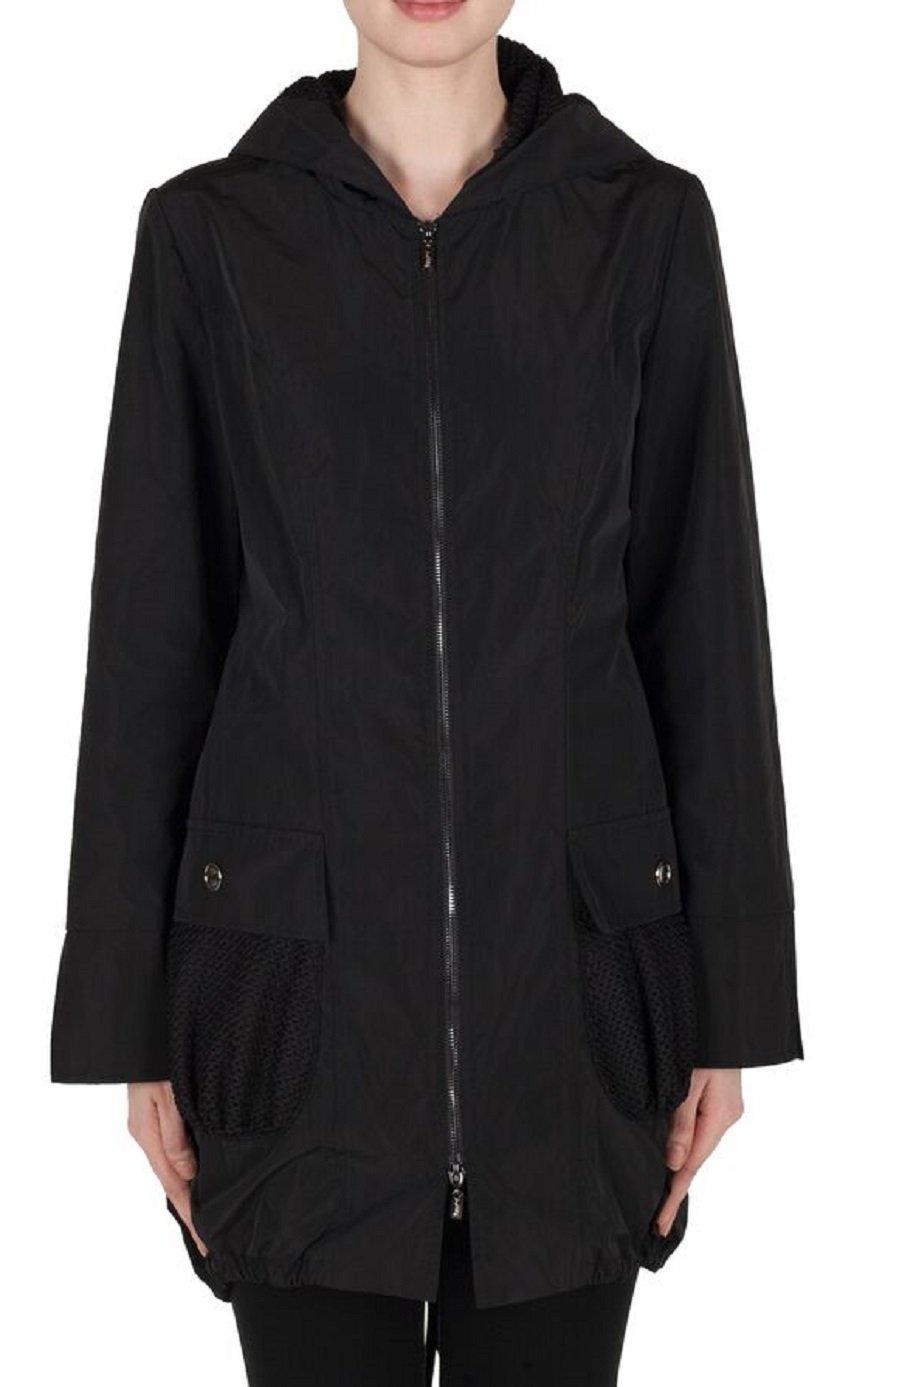 Joseph Ribkoff Black Front Zip Hooded Windbreaker Jacket Style 173496 Size 8 by Joseph Ribkoff